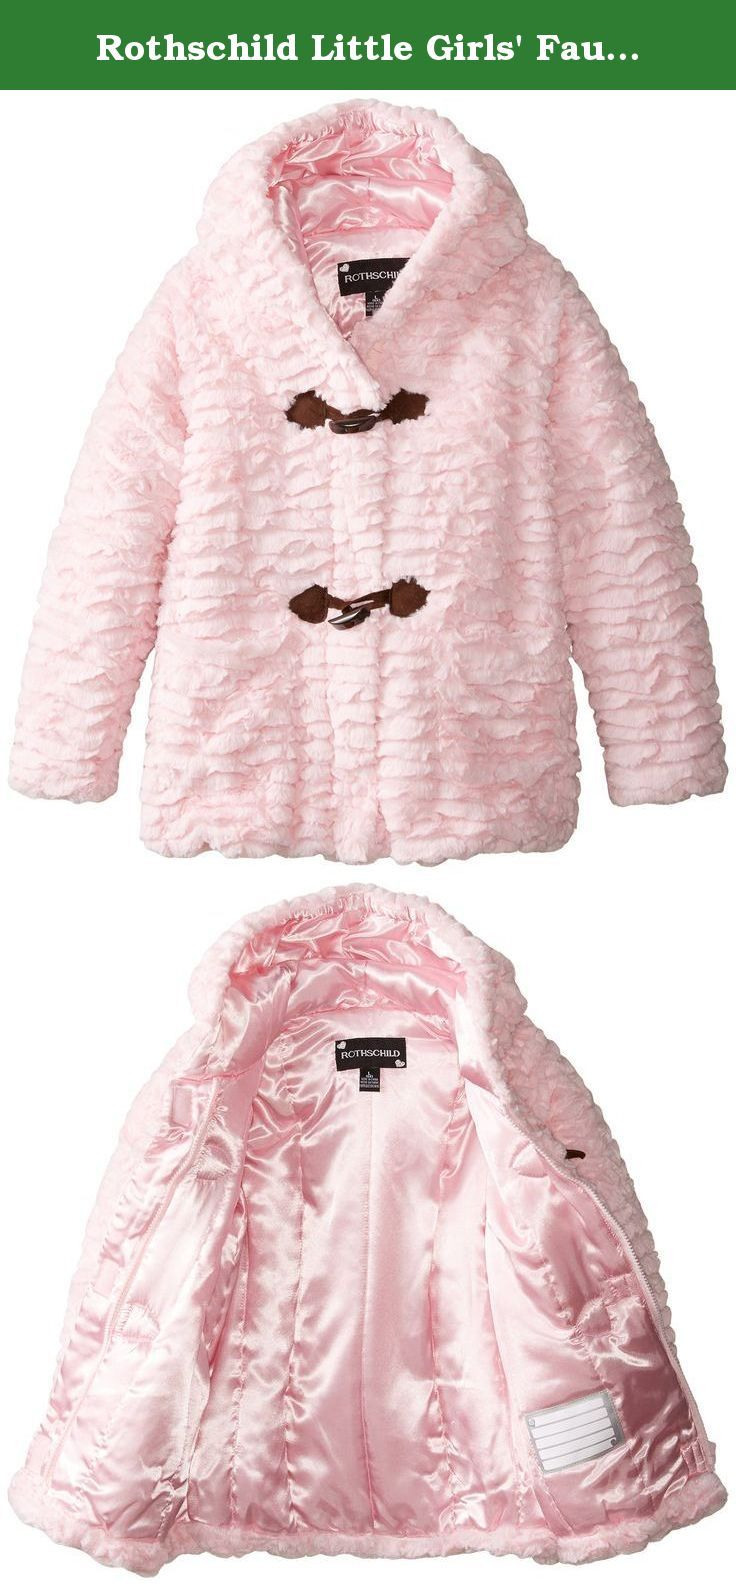 Pin On Dress Coats Jackets Coats Clothing Girls Clothing Shoes Jewelry [ 1585 x 736 Pixel ]